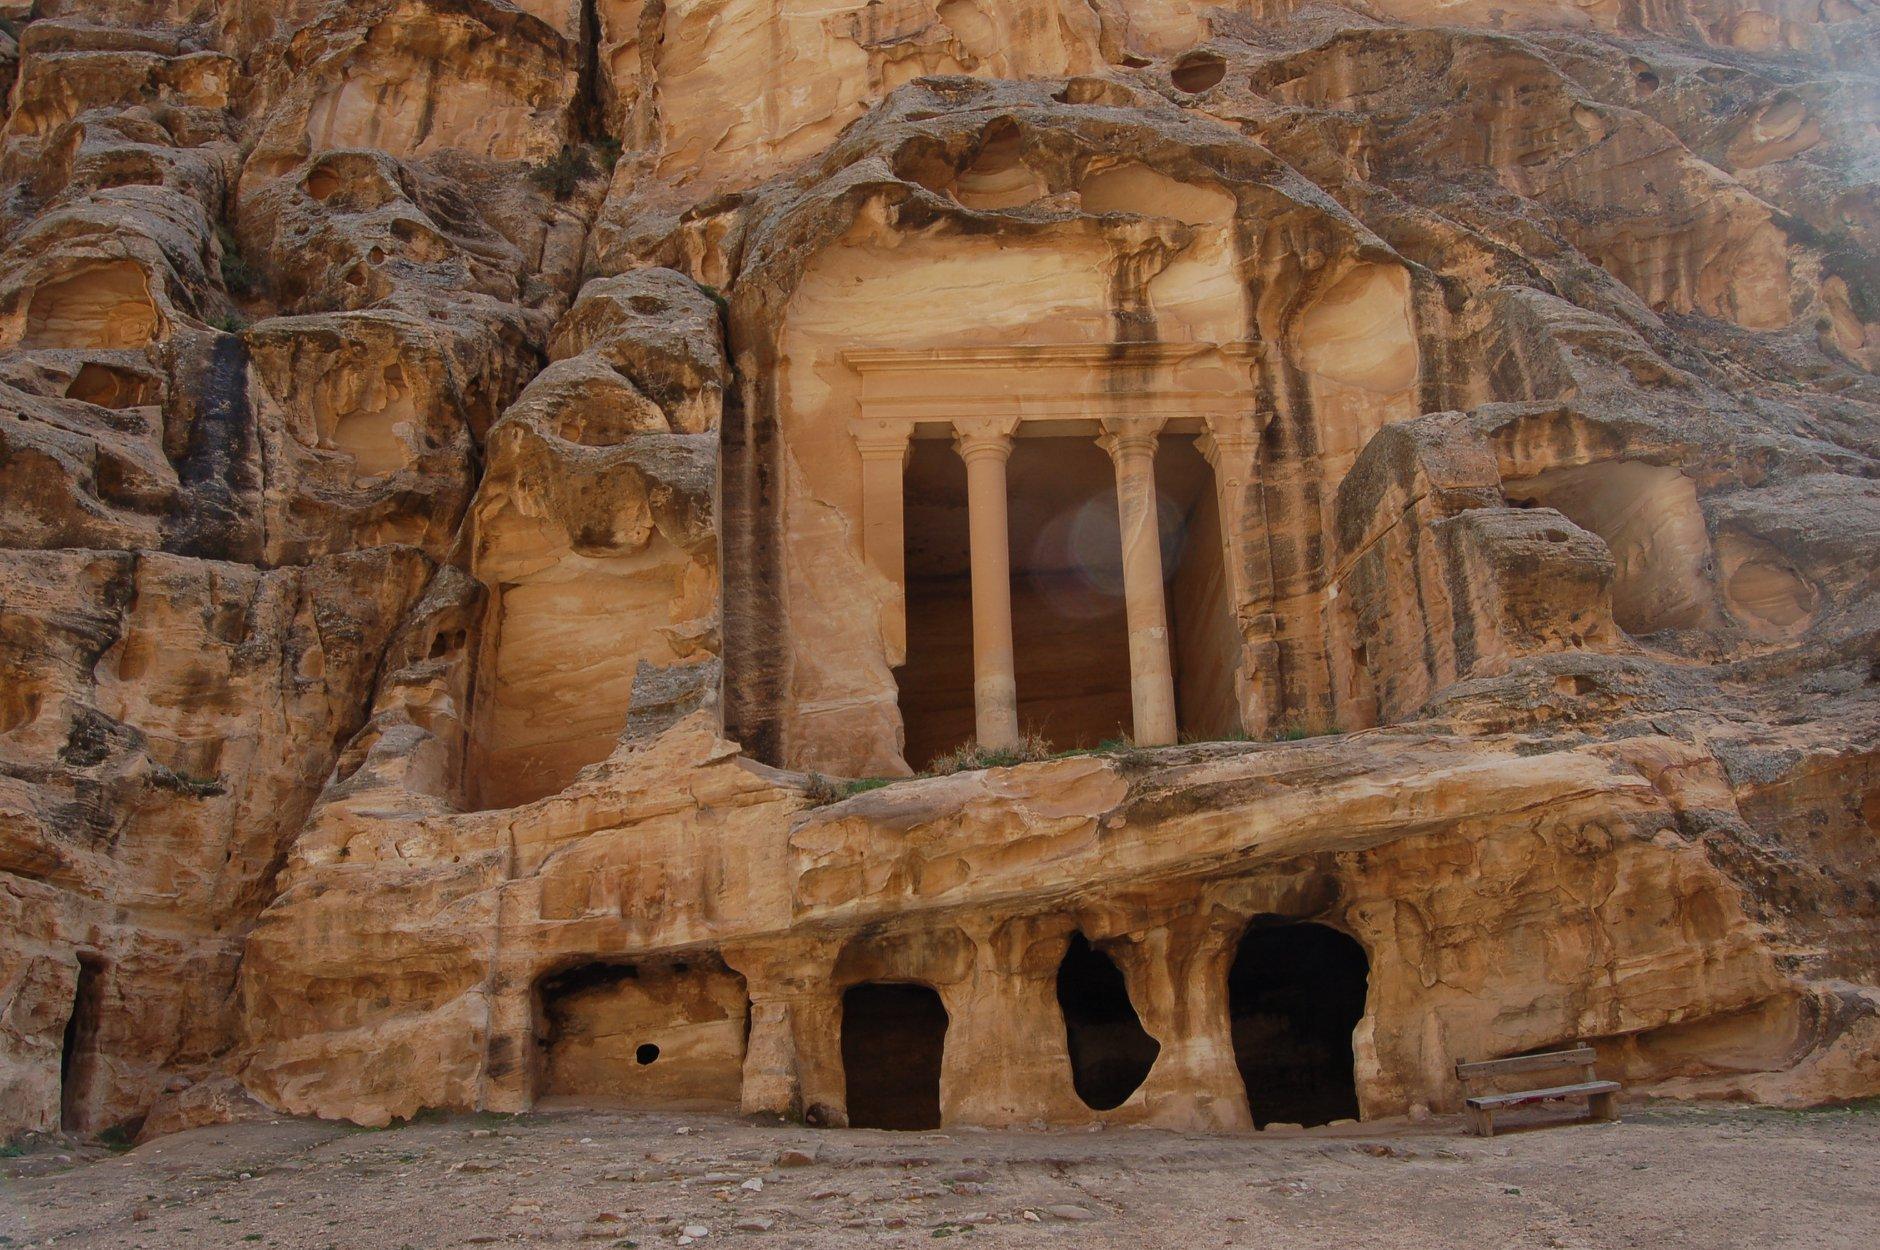 albert-tours-israel-little-petra-tomb